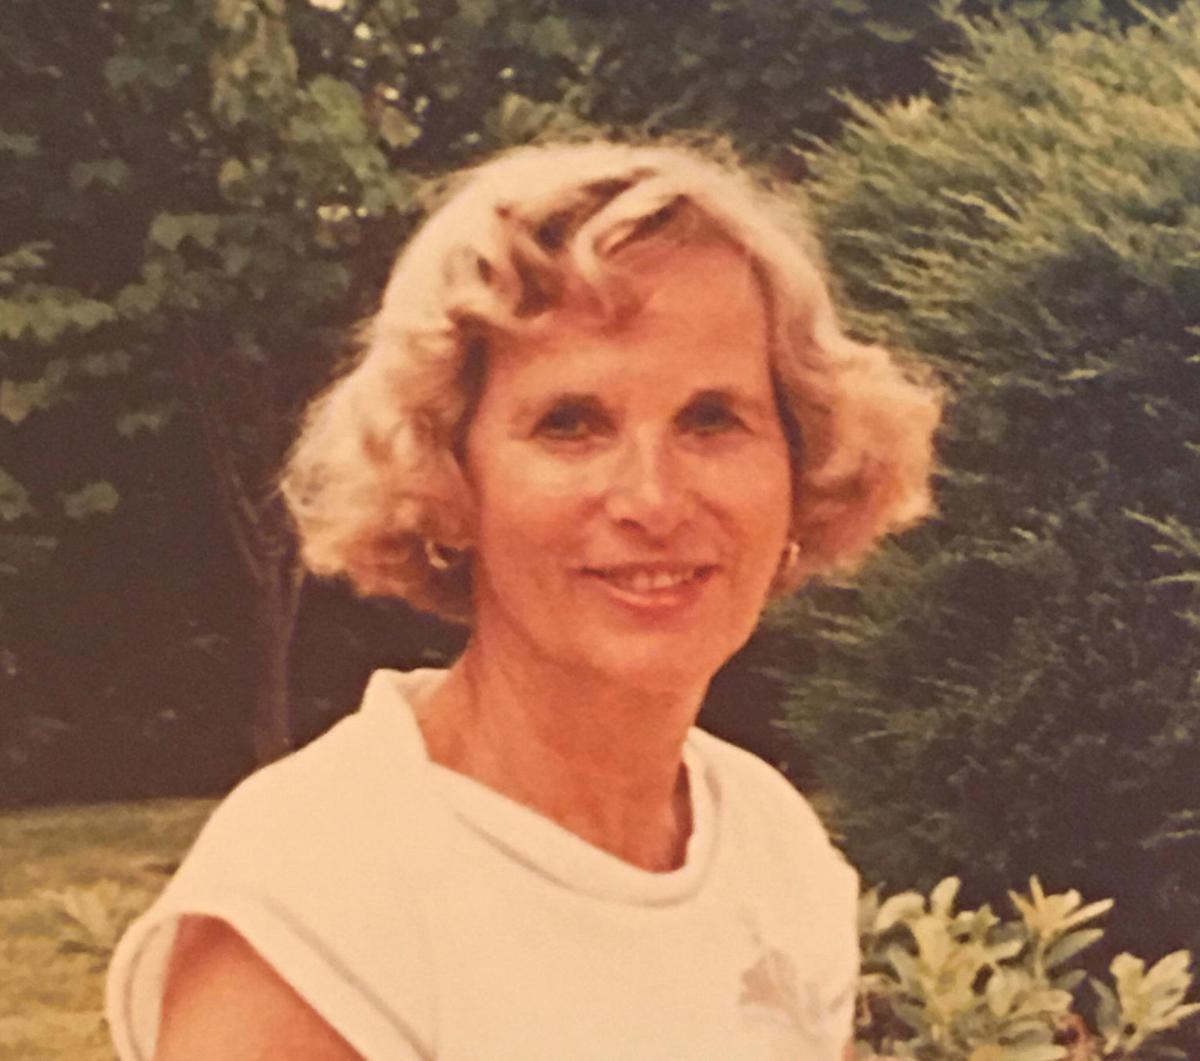 c57a7f8a1f3 Suzanne Carolyn Poffenberger Deeter